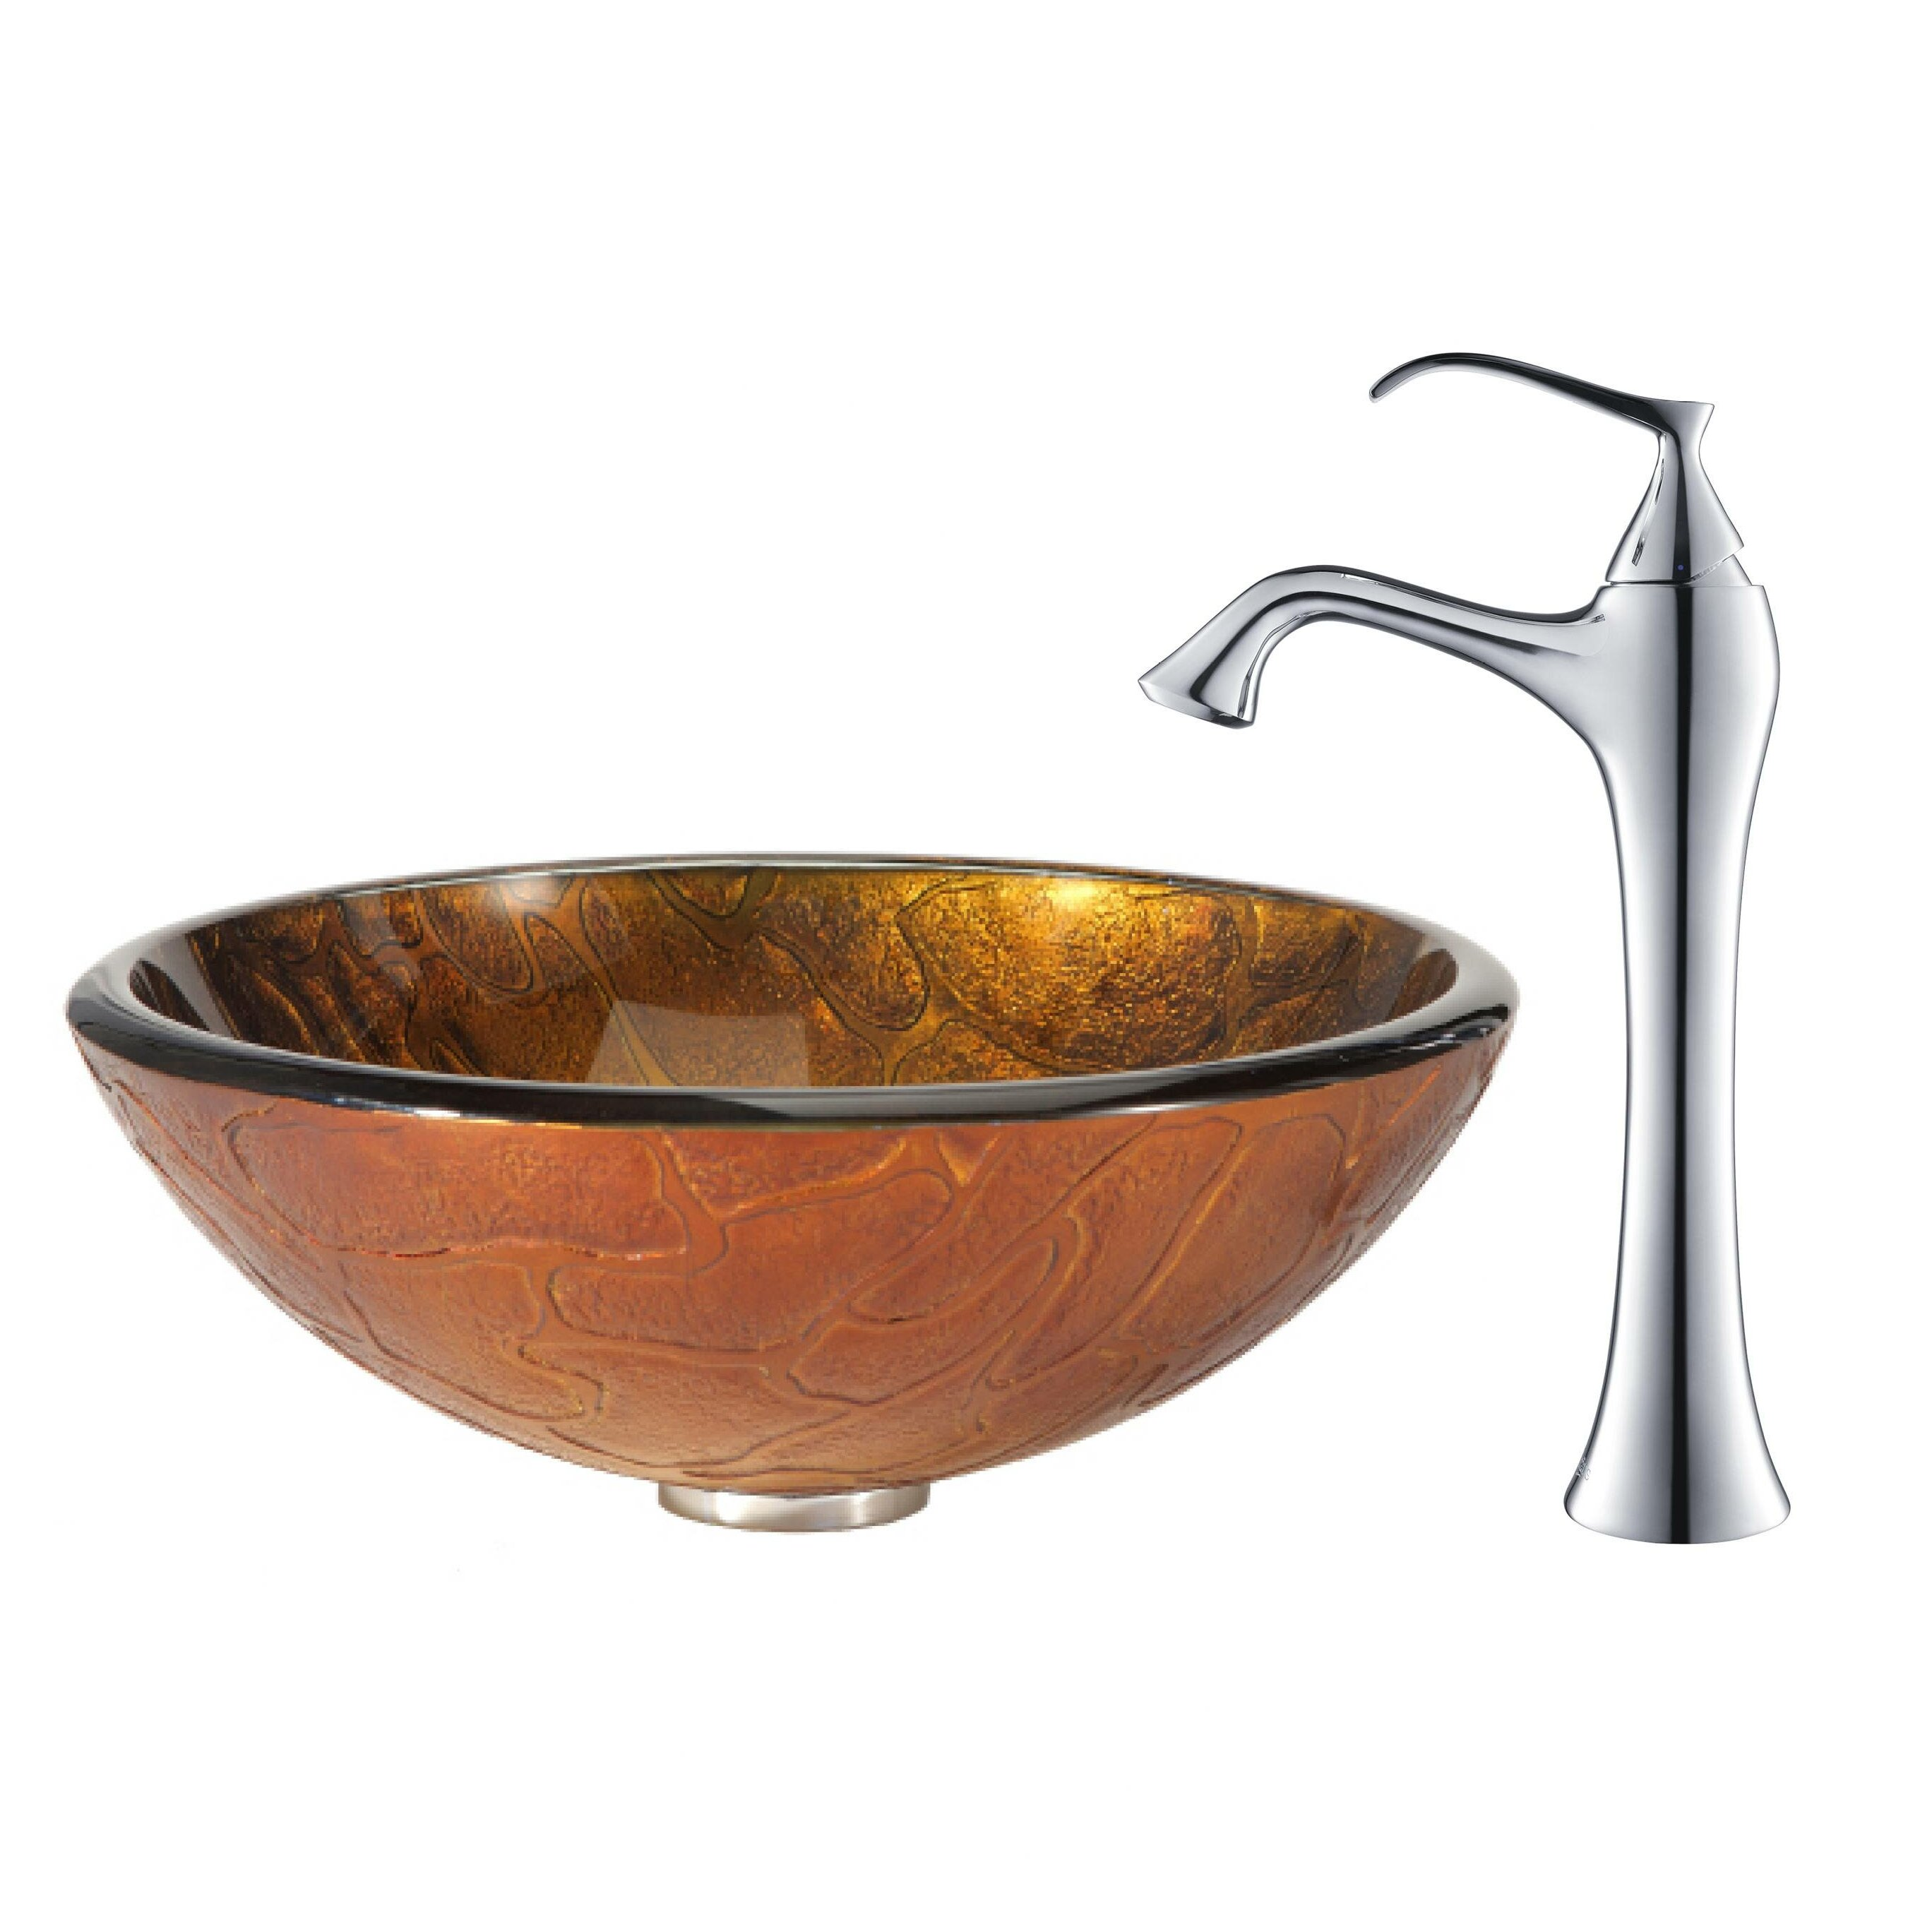 Kraus Triton Vessel Sink with Ventus Faucet & Reviews Wayfair